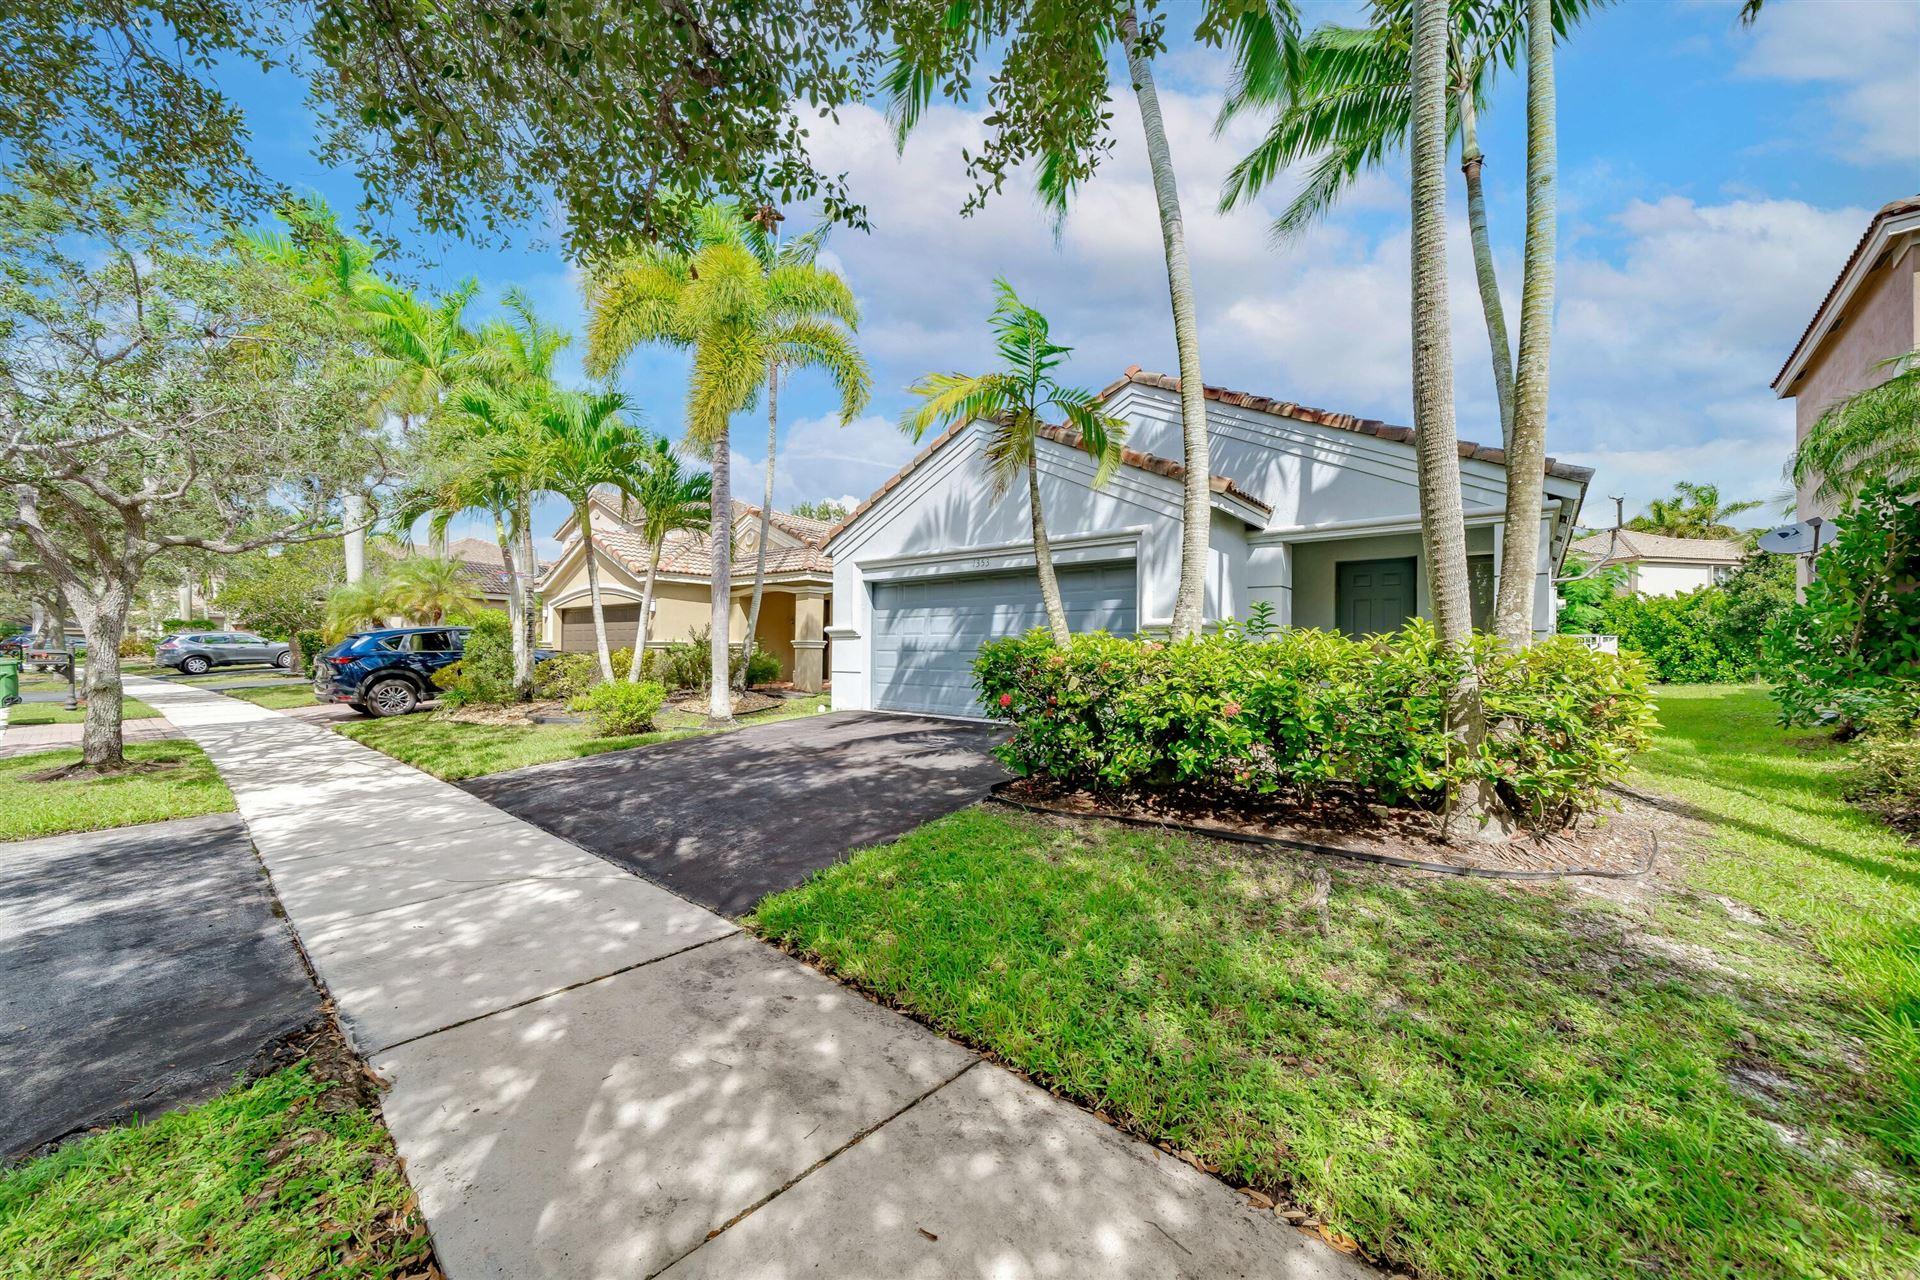 Photo of 1353 Canary Island Drive, Weston, FL 33327 (MLS # RX-10753501)